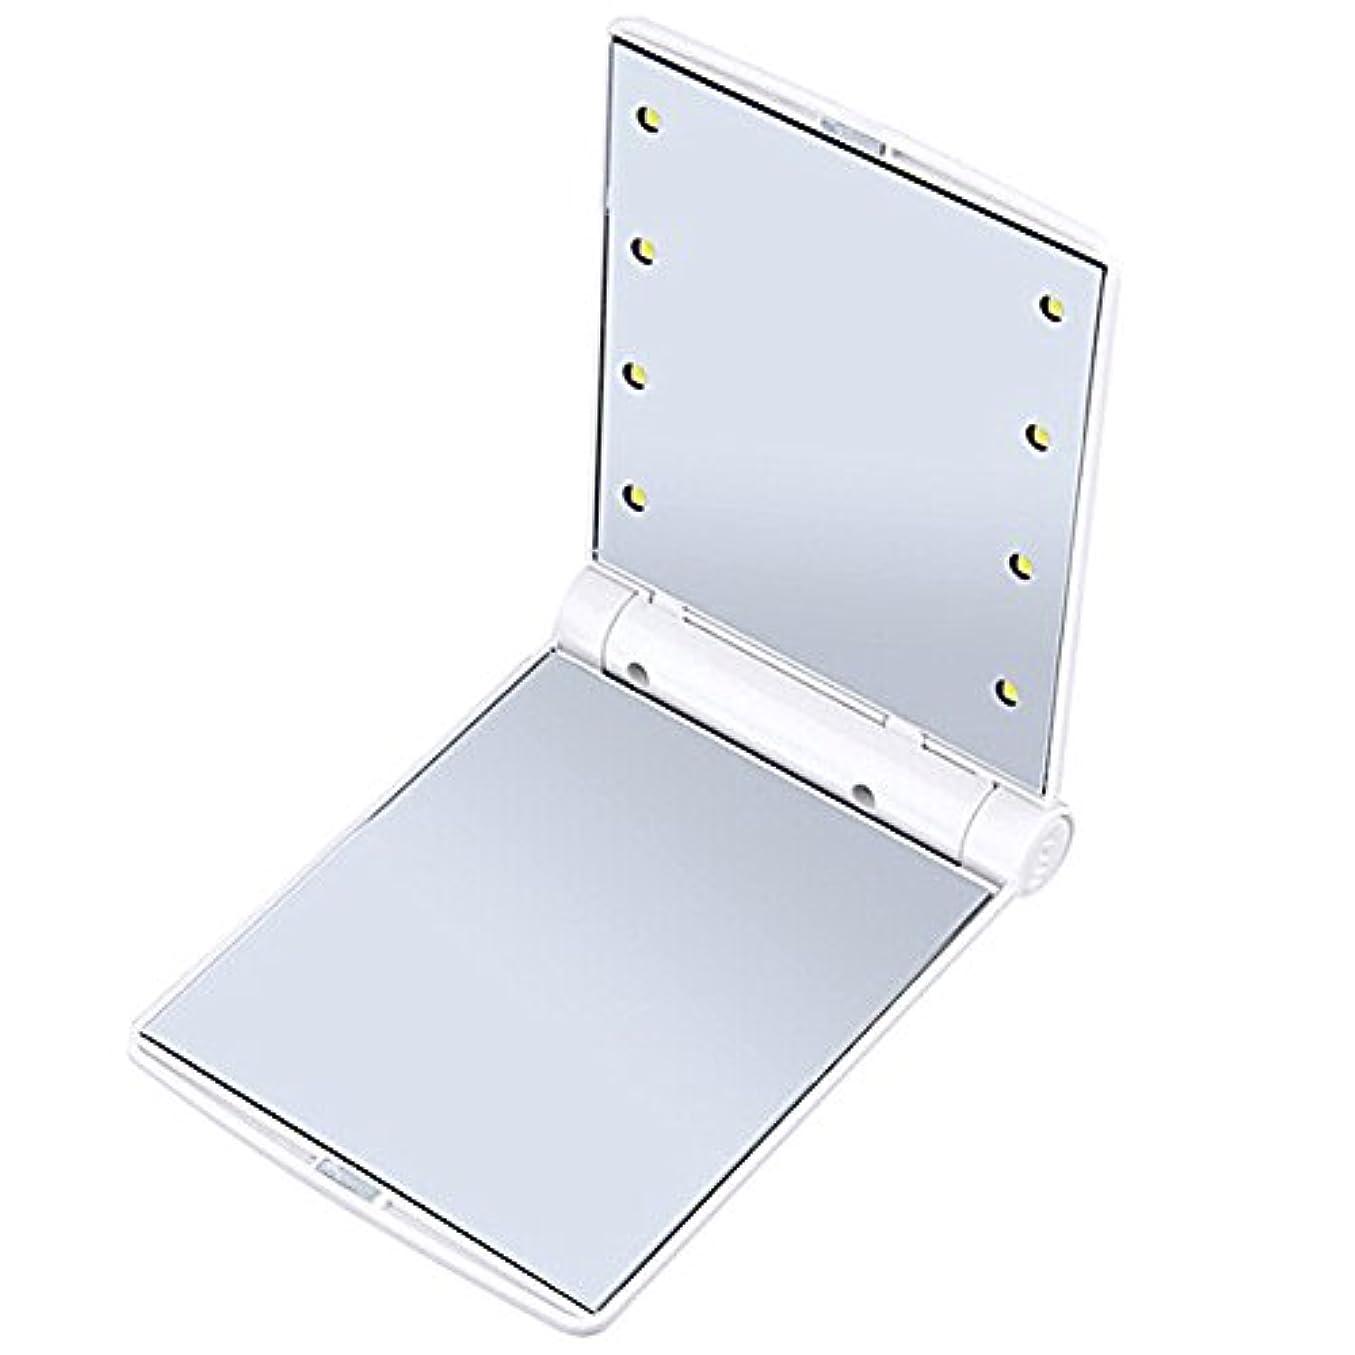 B-PING 鏡 化粧鏡 女優ミラー 調光型二面鏡 拡大鏡付き 330度調節可能 コンパクトミラー スタンドミラー 折りたたみ式 二面鏡 LED ライト8個 無印タイプ 5色のオプション (ホワイト)